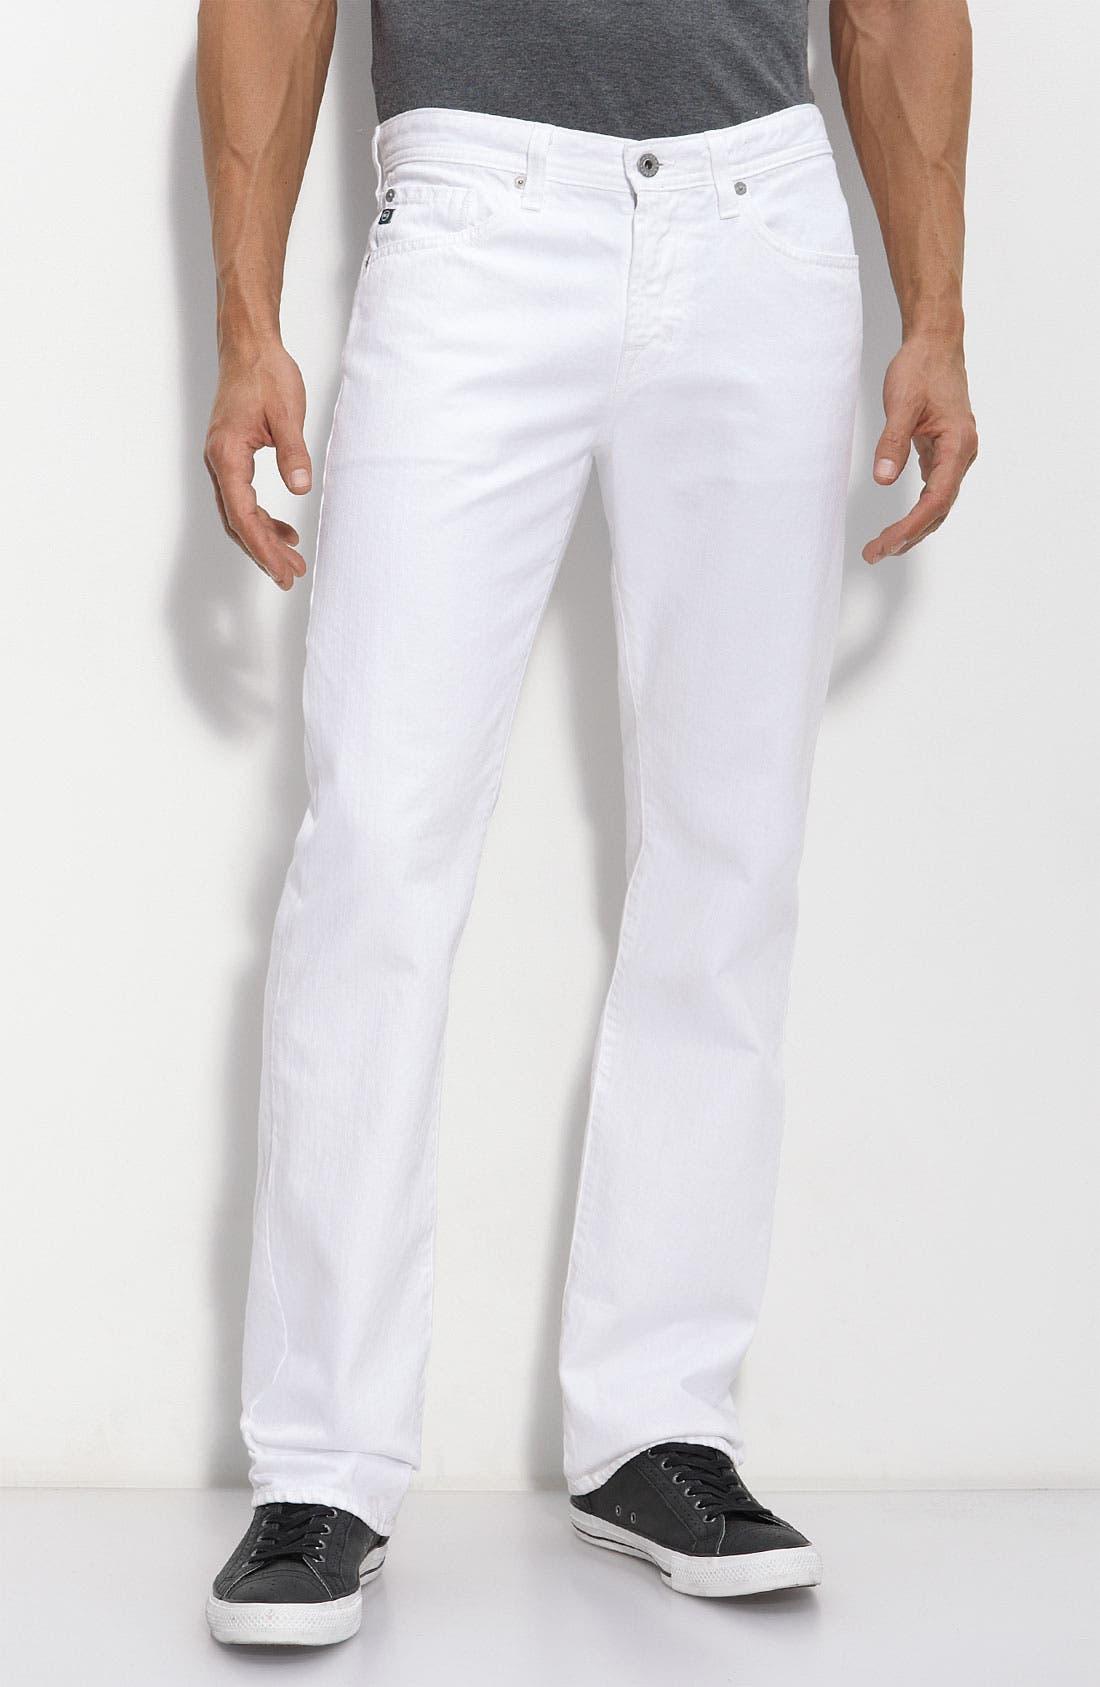 Alternate Image 1 Selected - AG Jeans 'Protégé' Straight Leg Jeans (White Wash)